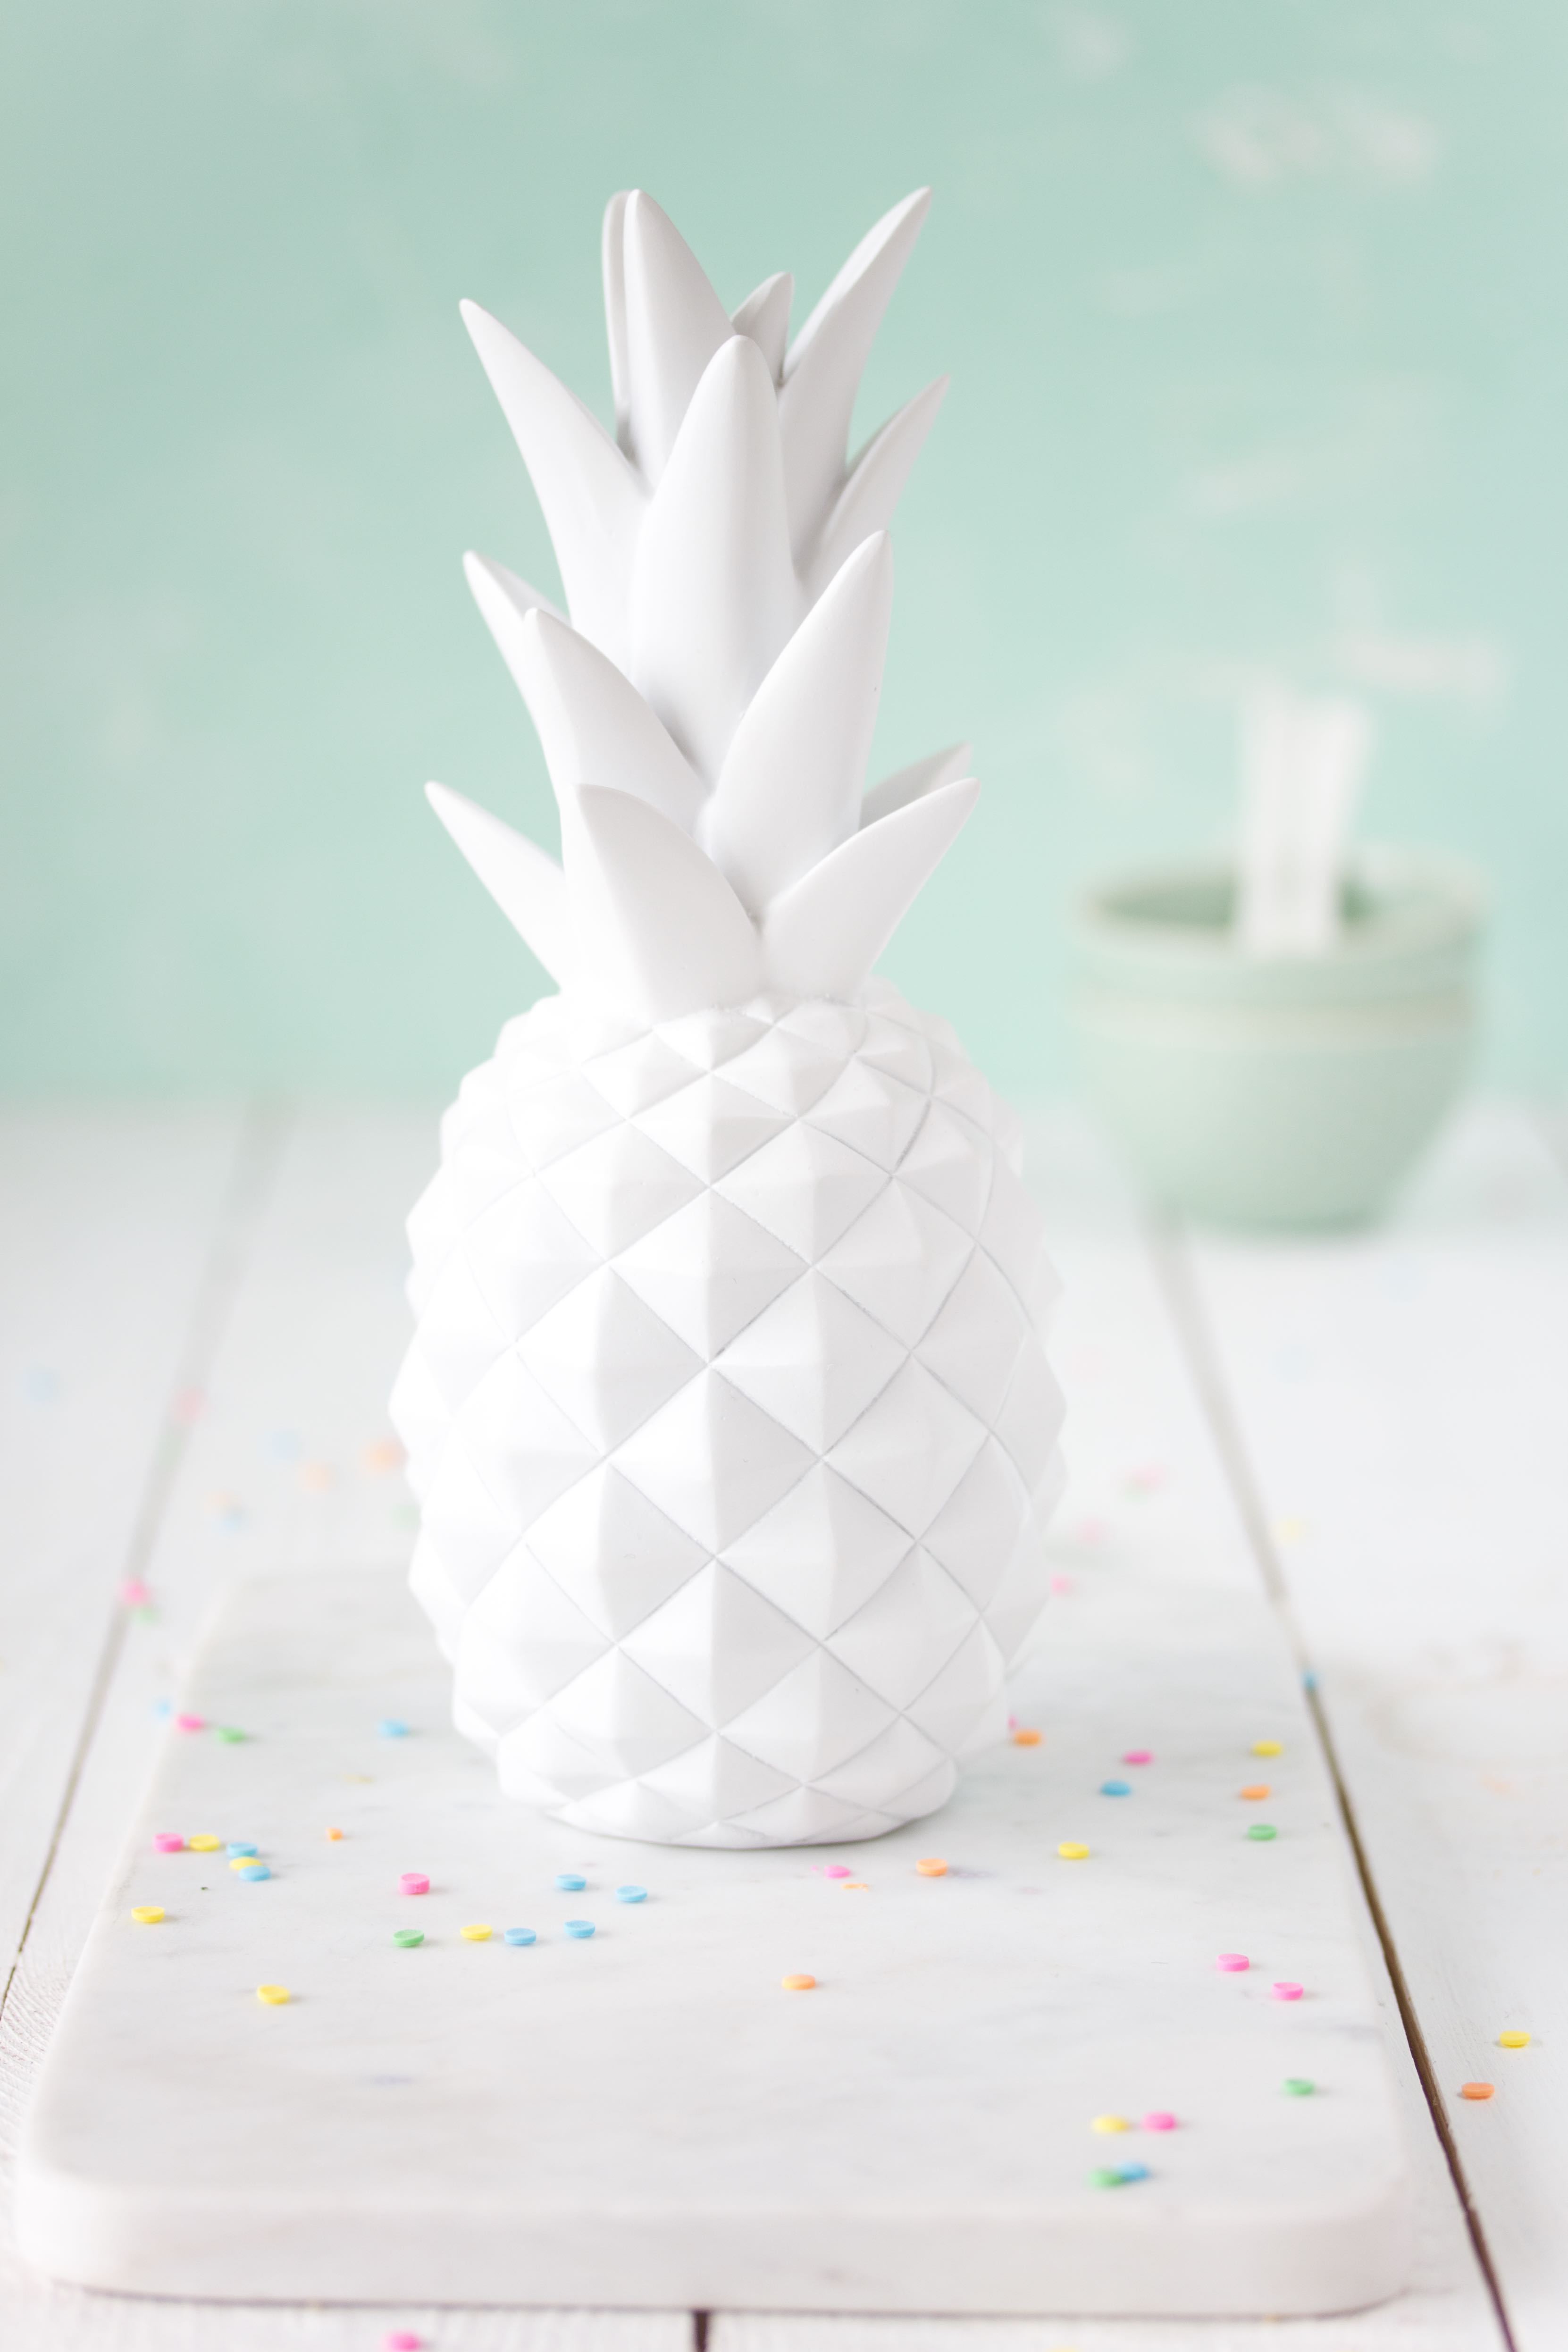 Smoothie Rezept: Ananas Kokos gesund lecker einfach healthy vegan #smoothie #ananas #pineapple #drink #breakfast #vegan   Emma´s Lieblingsstücke